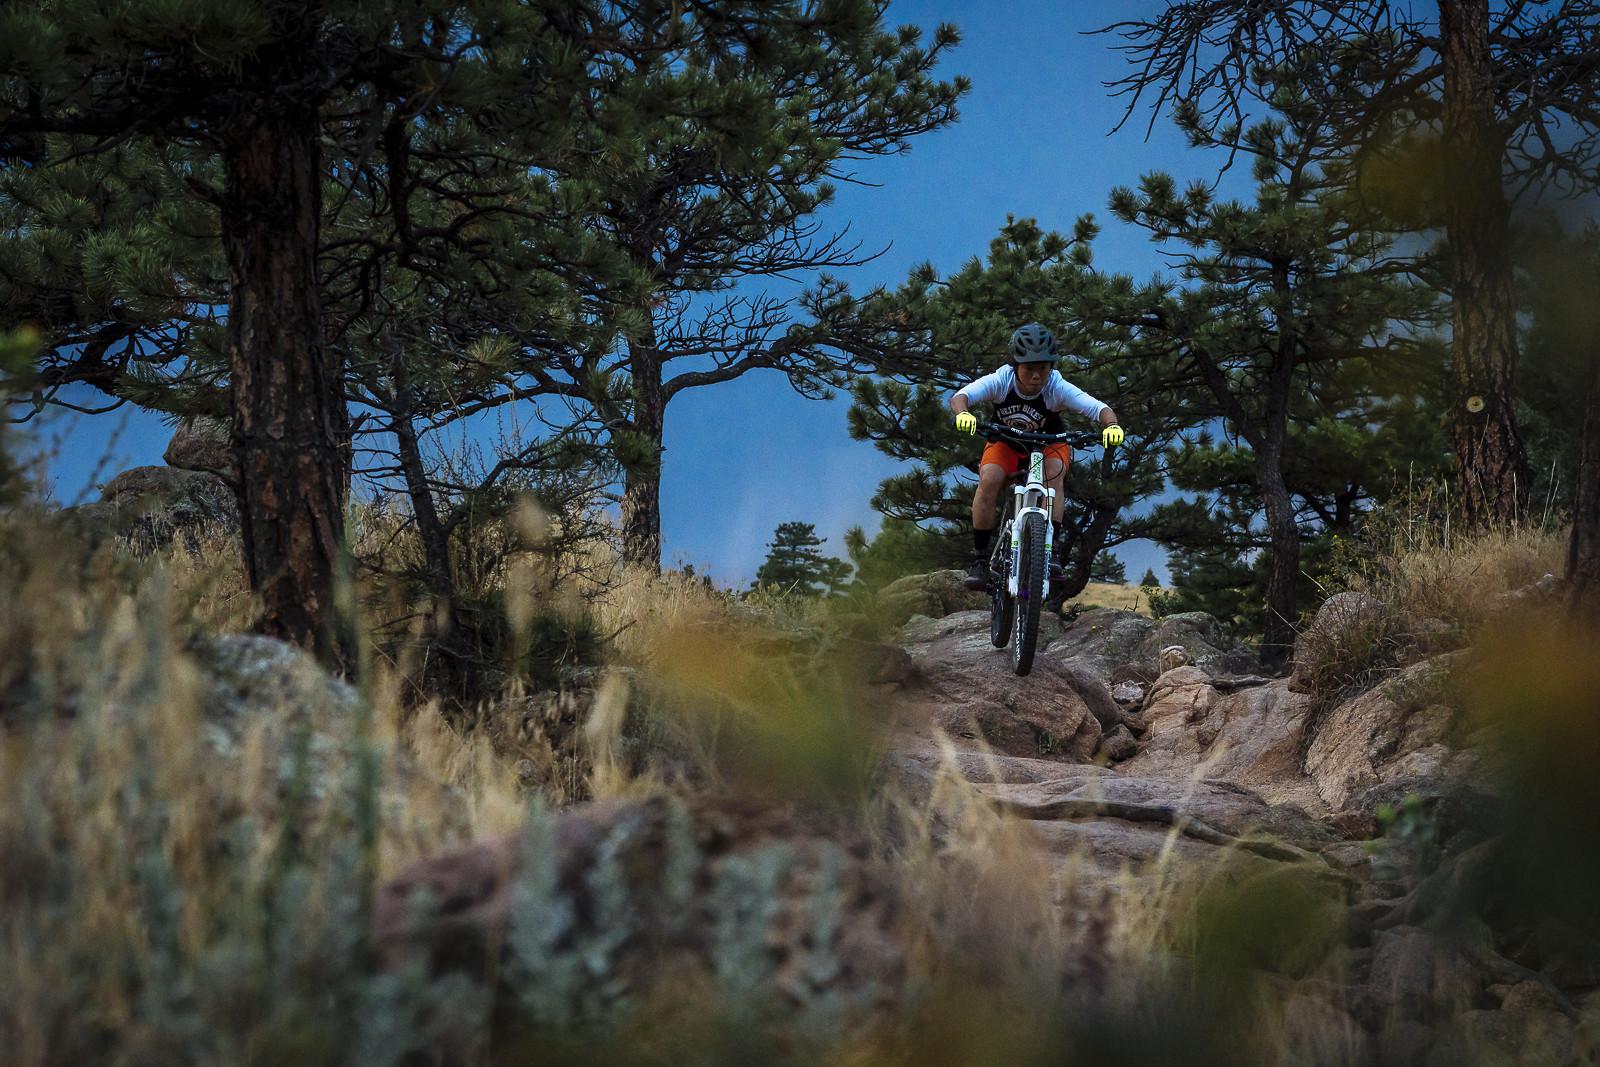 Autumn Trail Riding - gold_007 - Mountain Biking Pictures - Vital MTB